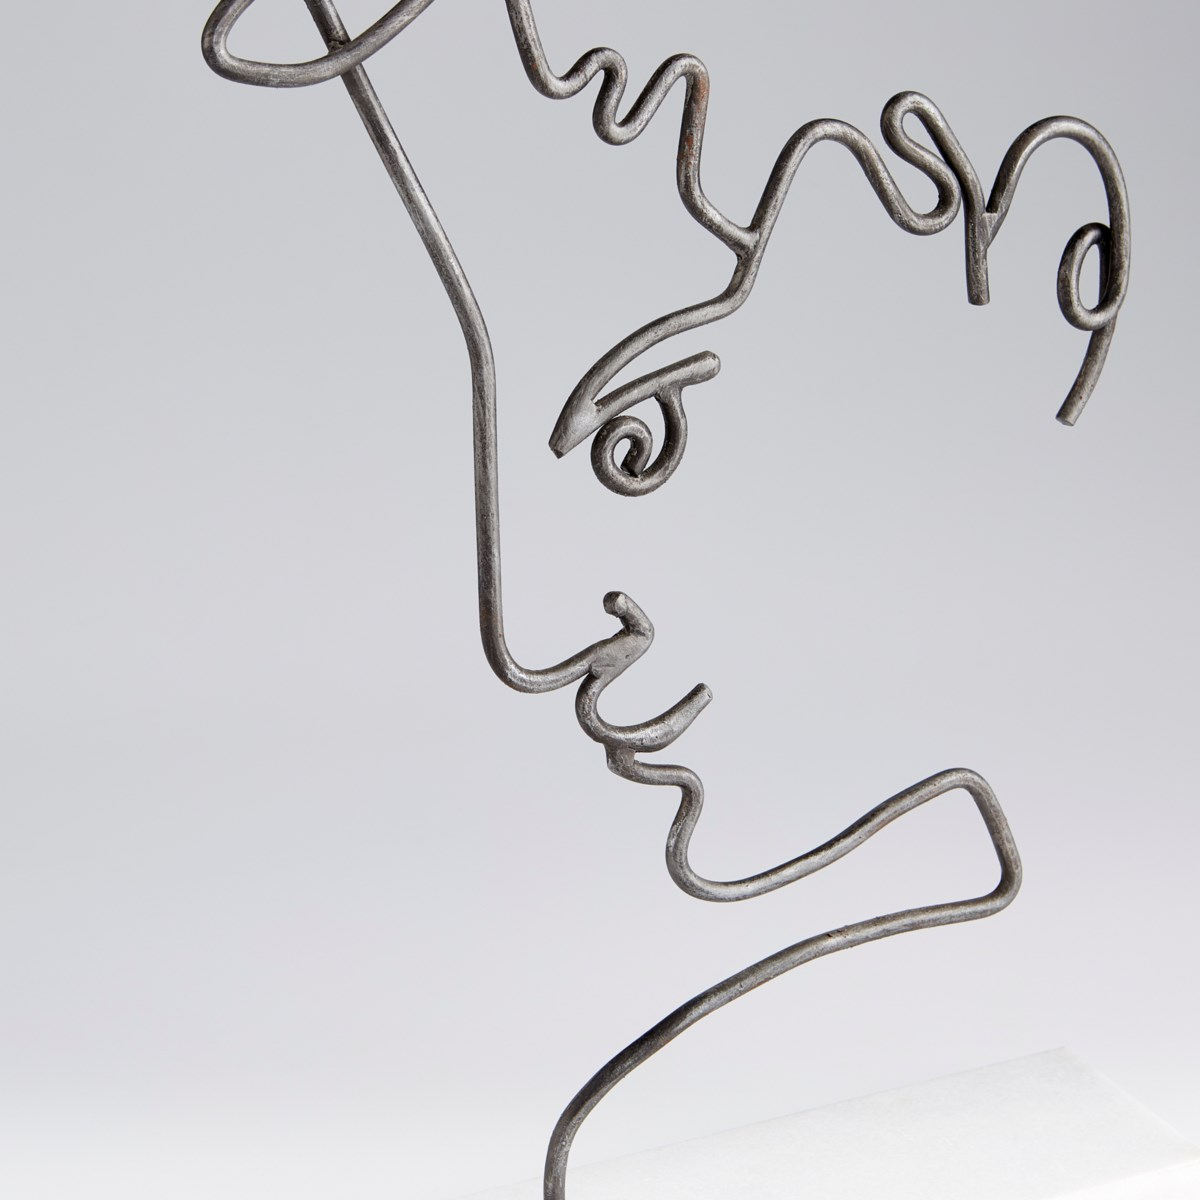 Viso Sculpture